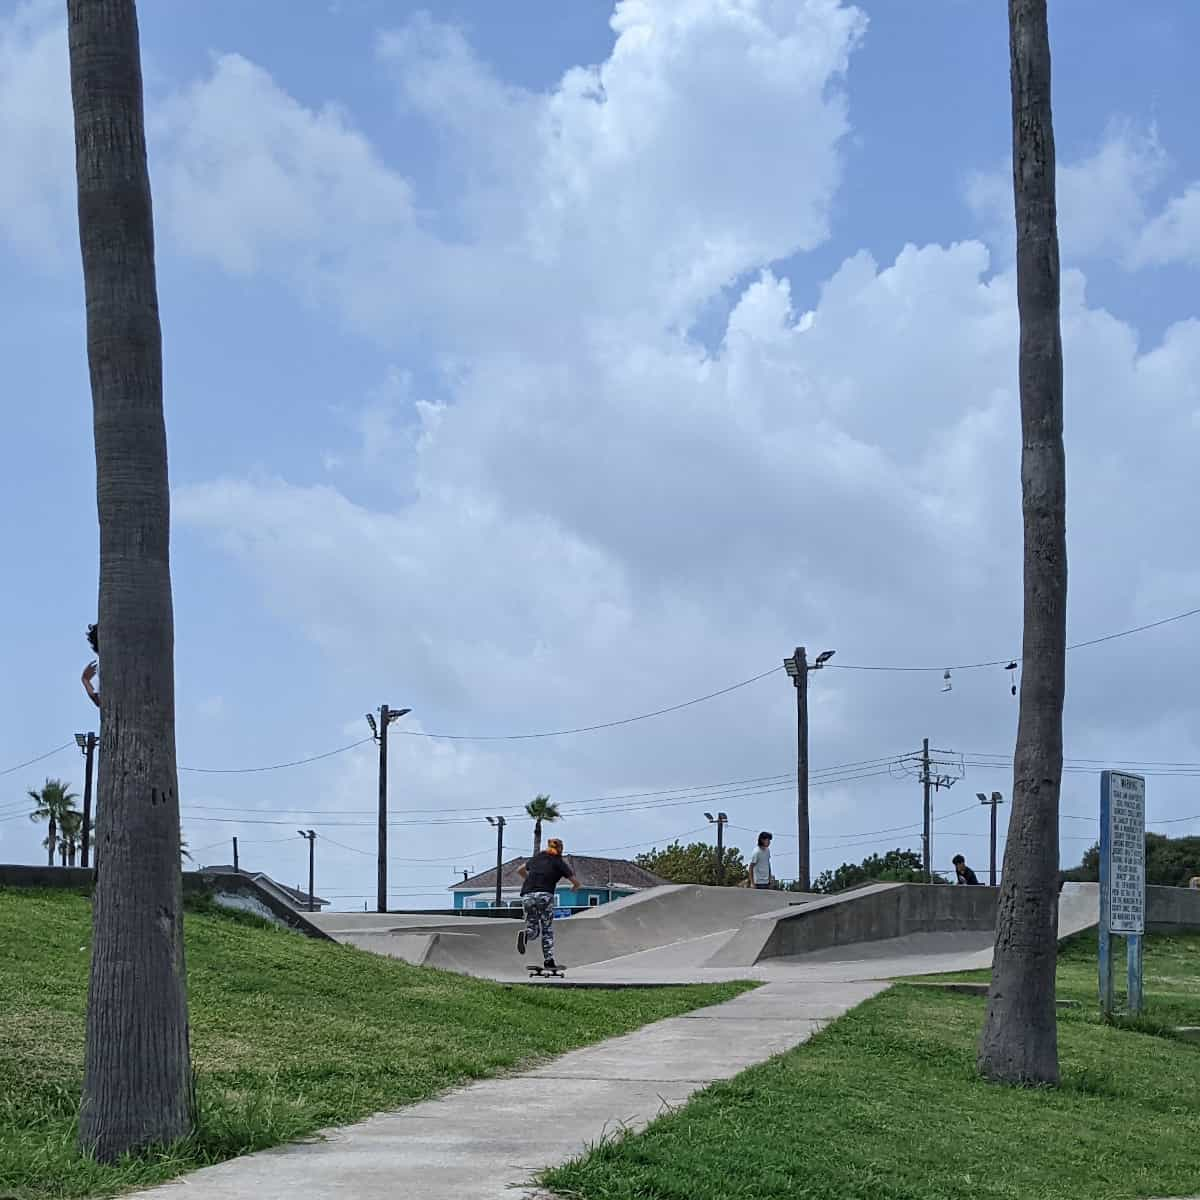 Menard Park Galveston Skate Park